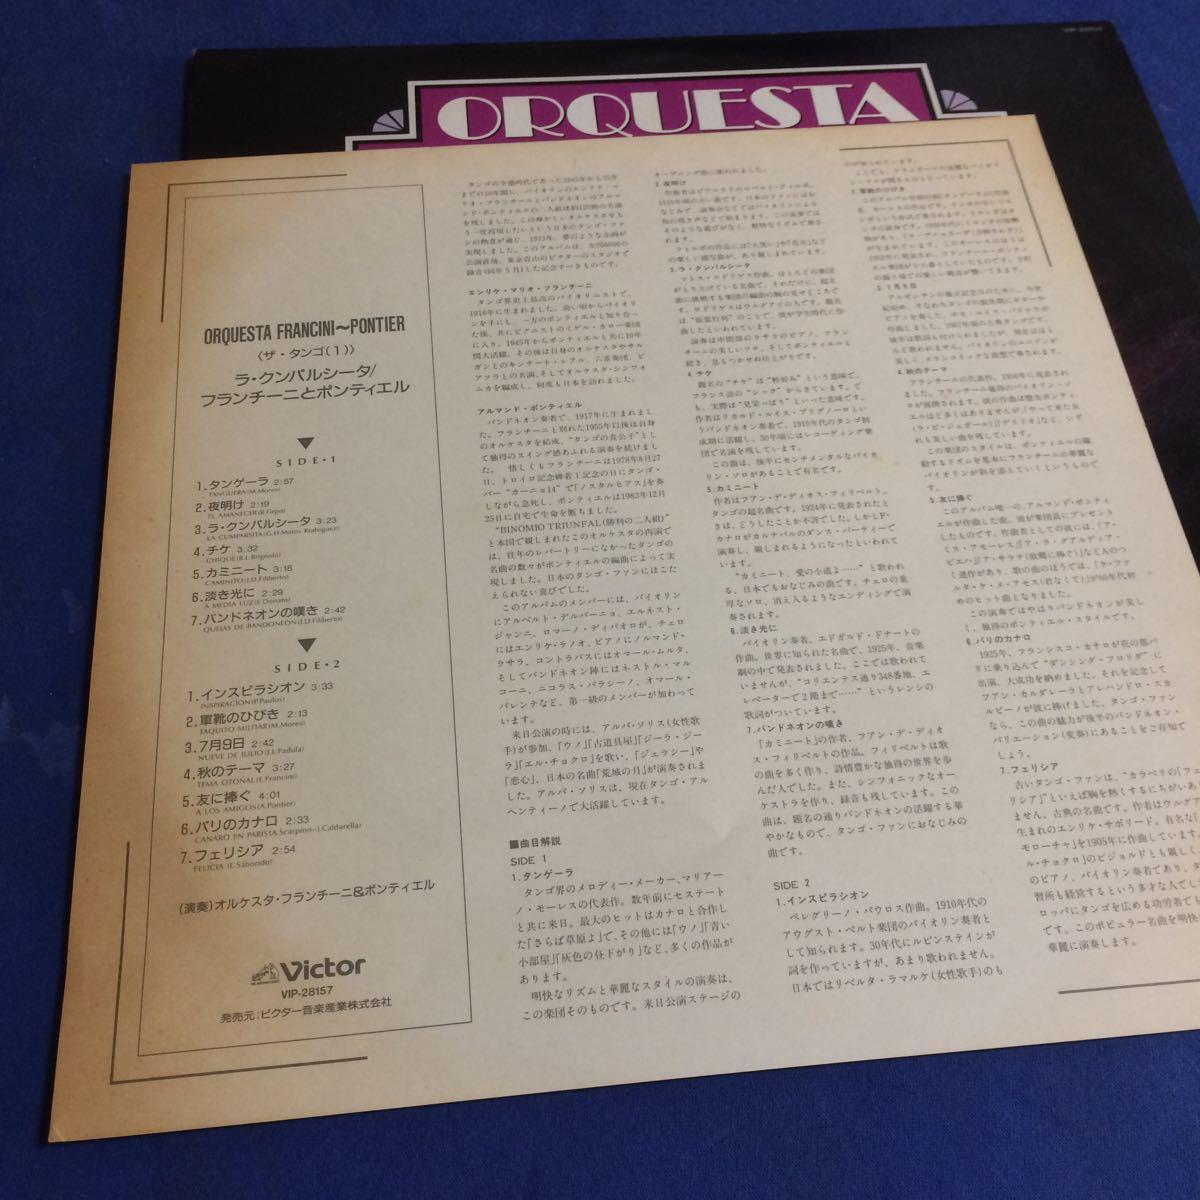 LP 《ラ・クンパルシータ》タンゴ界史上最高のバイオリニスト E・M・フランチーニ&A・ポンティエル 伝説のタンゴデュオ_画像5